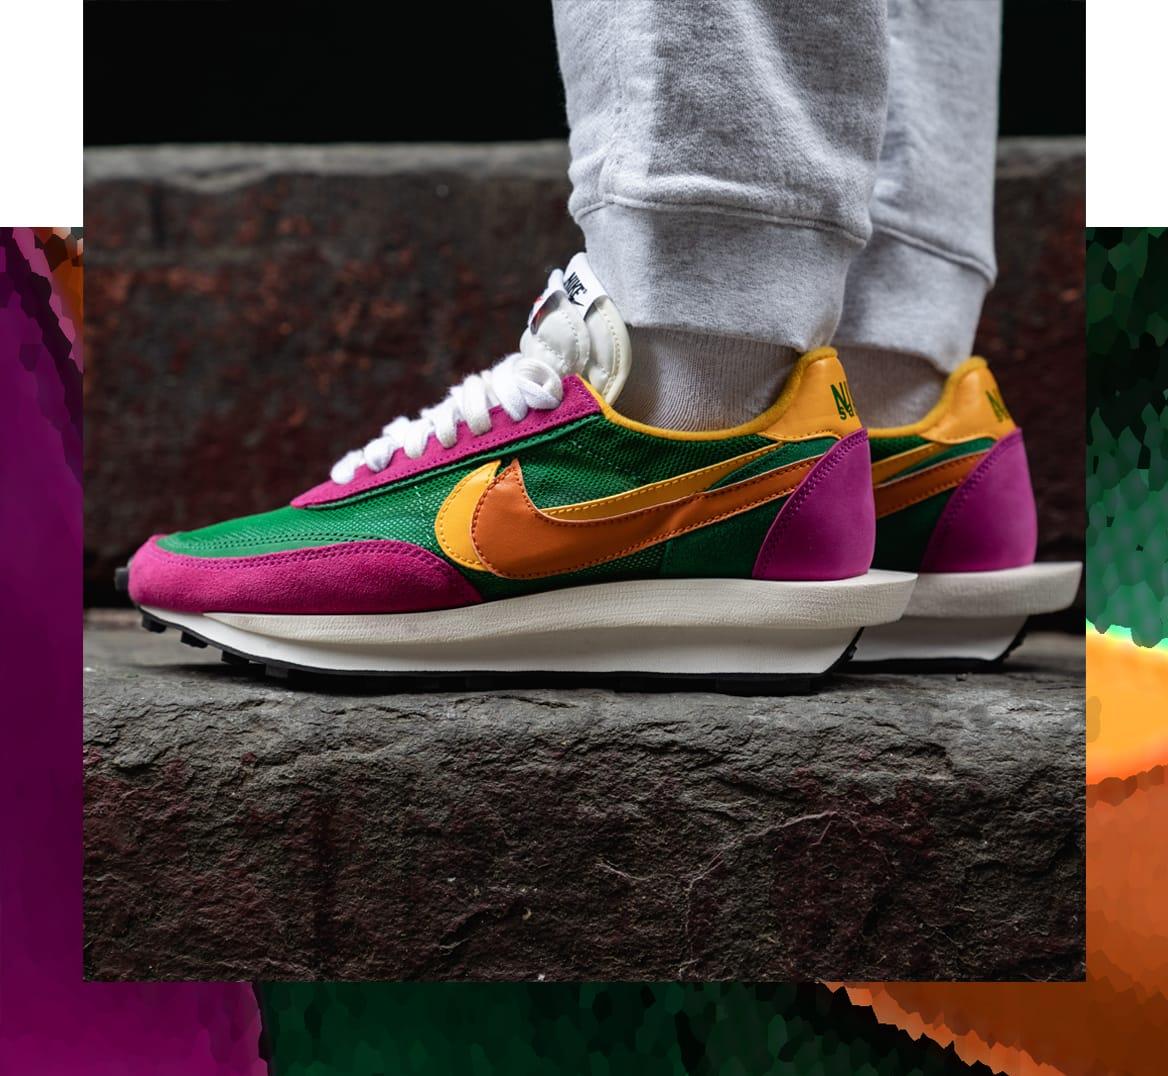 The Best Sneakers of 2019 | HYPEBEAST